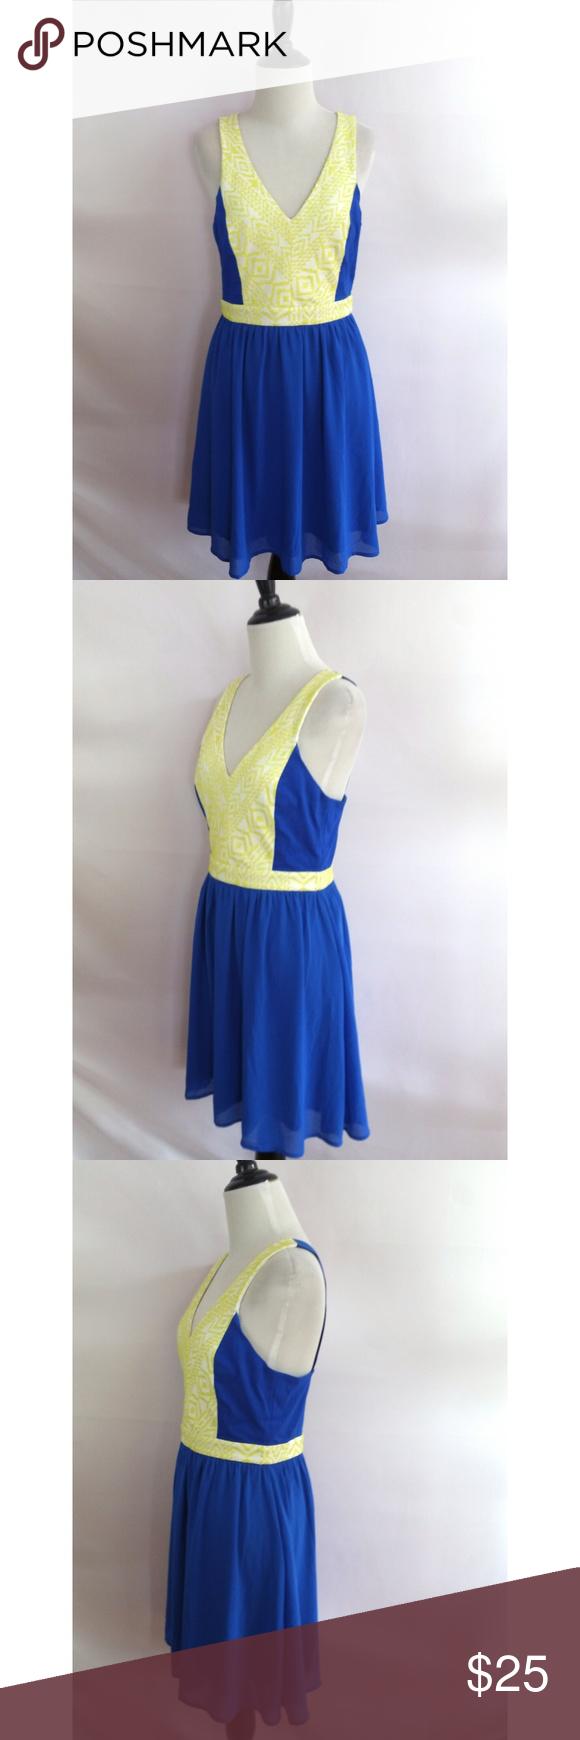 Jealous Tomato Size M Blue Dress Yellow Trim Item Specifics Size M Back Zipper 100 Polyester Lined Hand Wash Nwt Please Ch Dresses Yellow Dress Blue Dresses [ 1740 x 580 Pixel ]